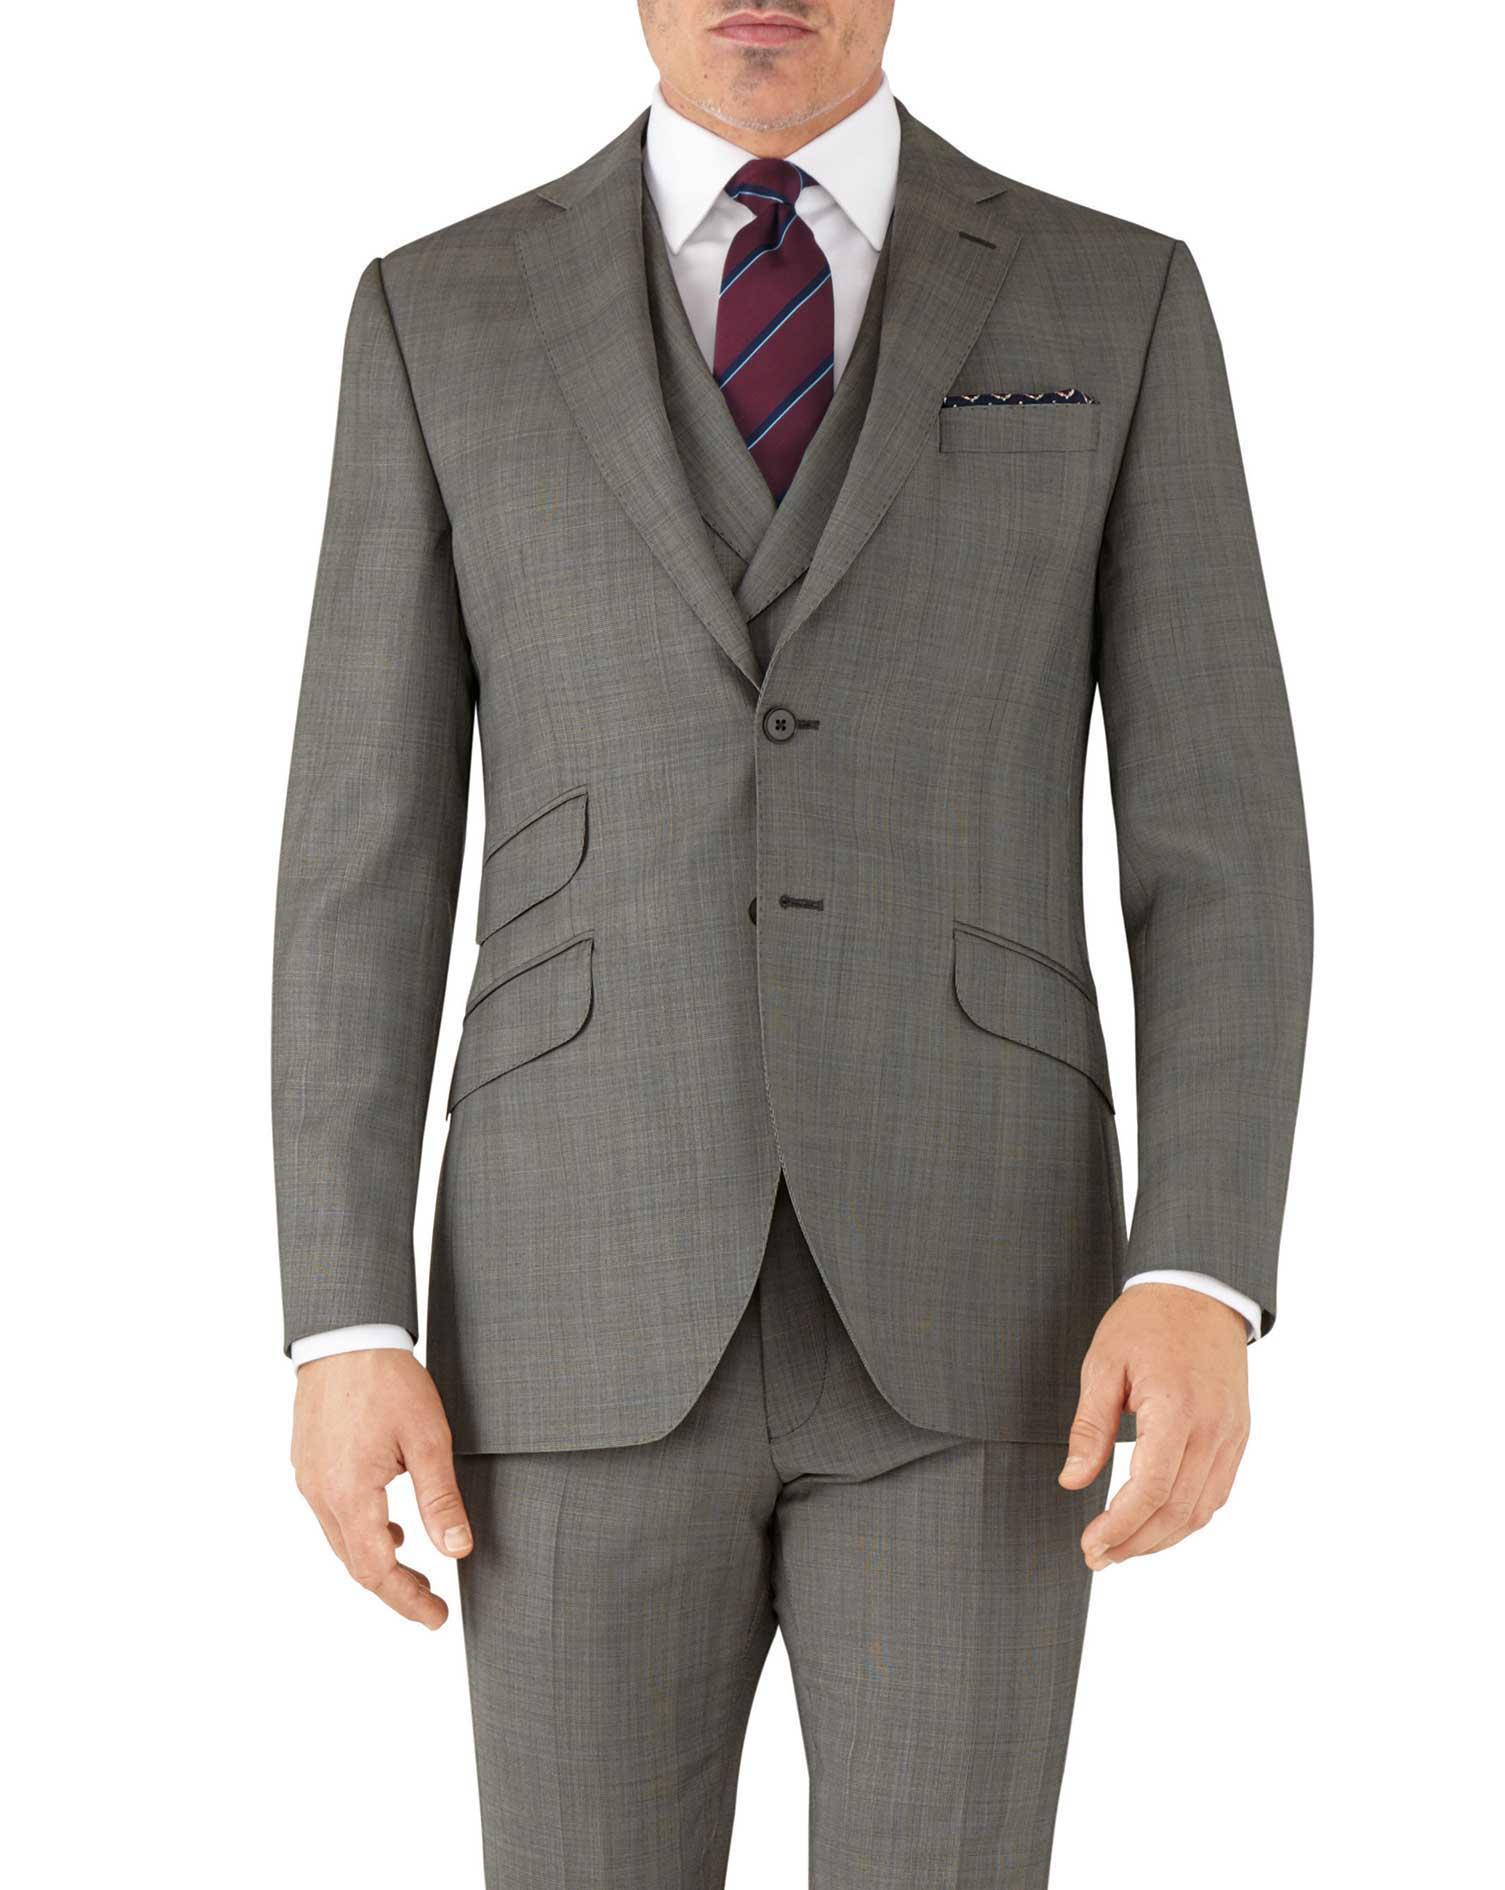 Silver Slim Fit Italian Sharkskin Luxury Check Suit Wool Jacket Size 36 Short by Charles Tyrwhitt